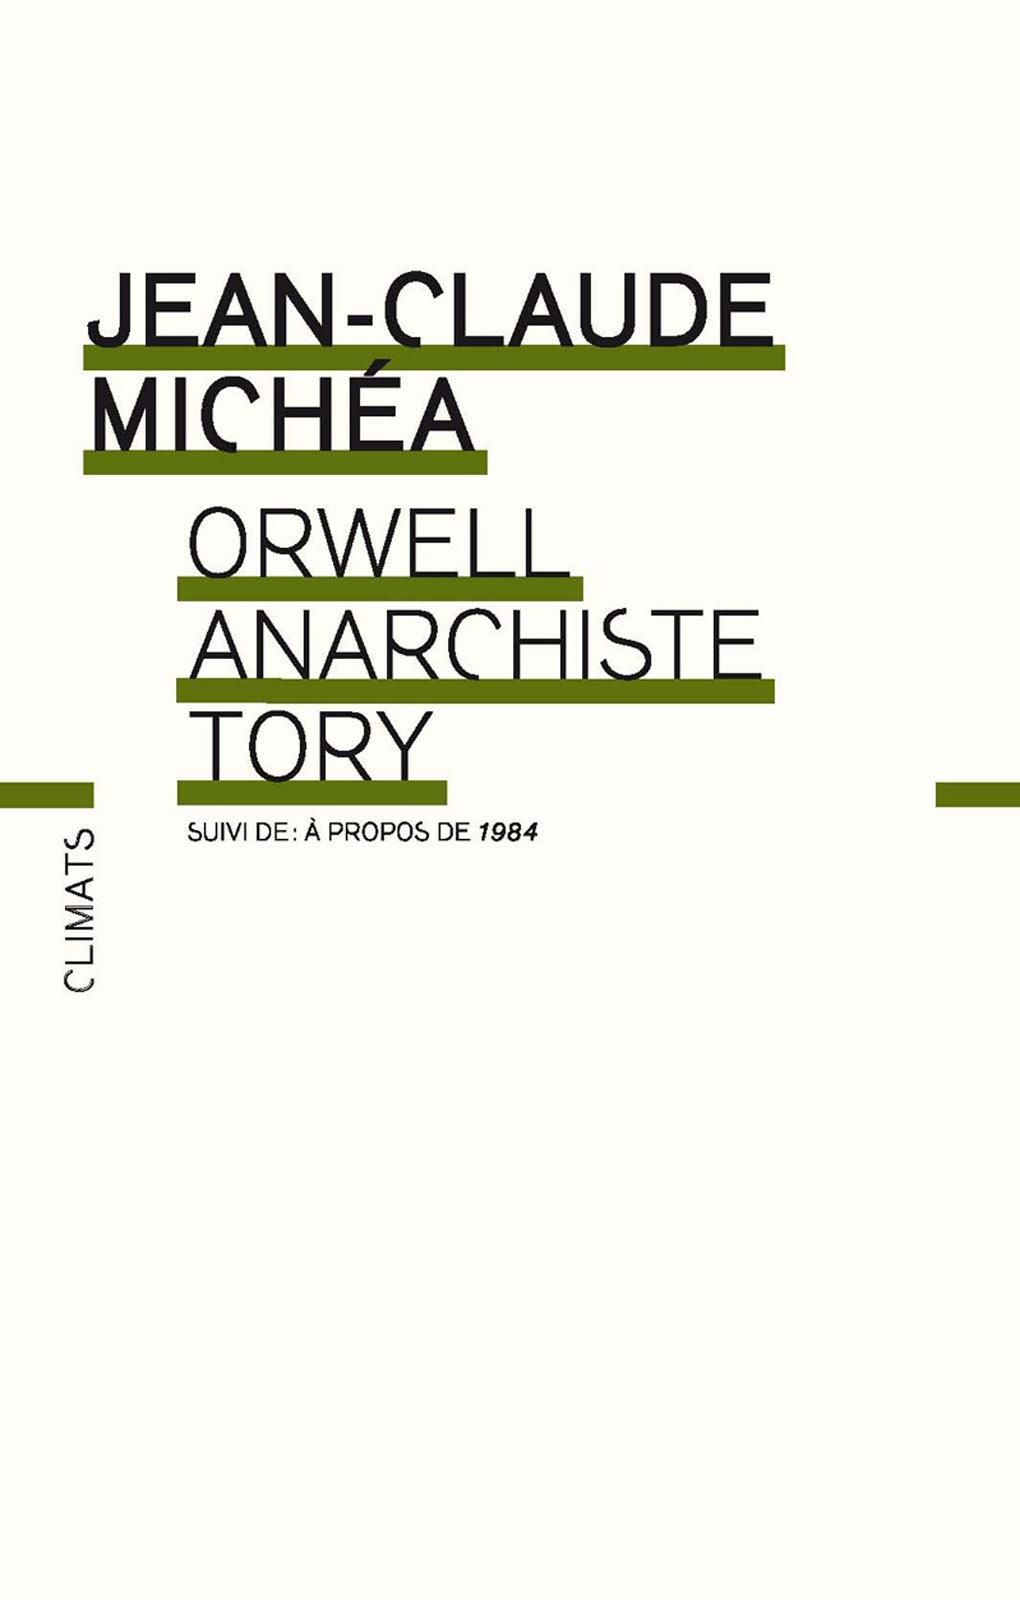 Orwell, anarchiste Tory